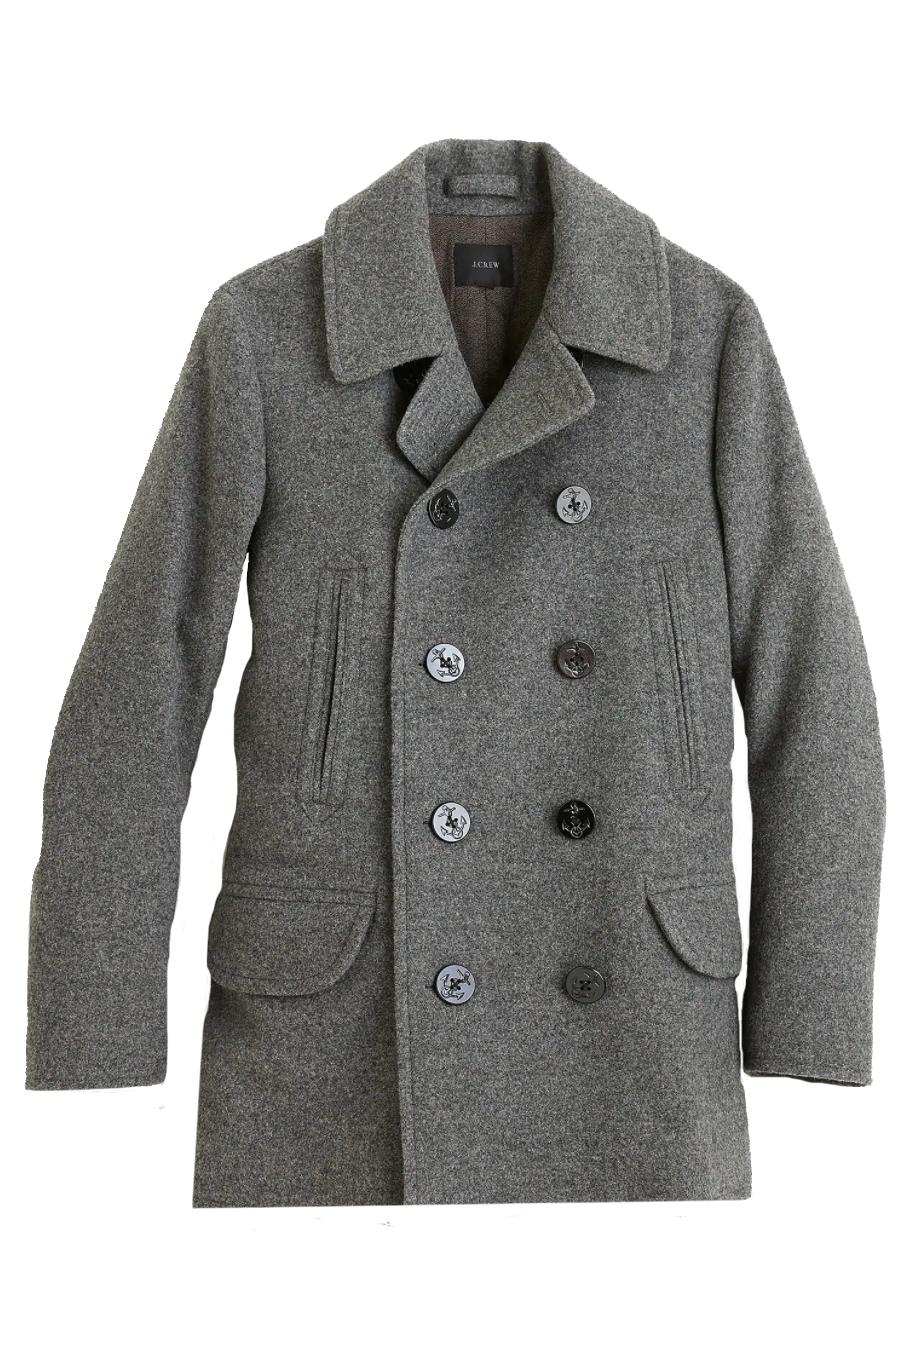 30 Best Winter Coats 2018 Warmest Men S Jackets For Cold Weather